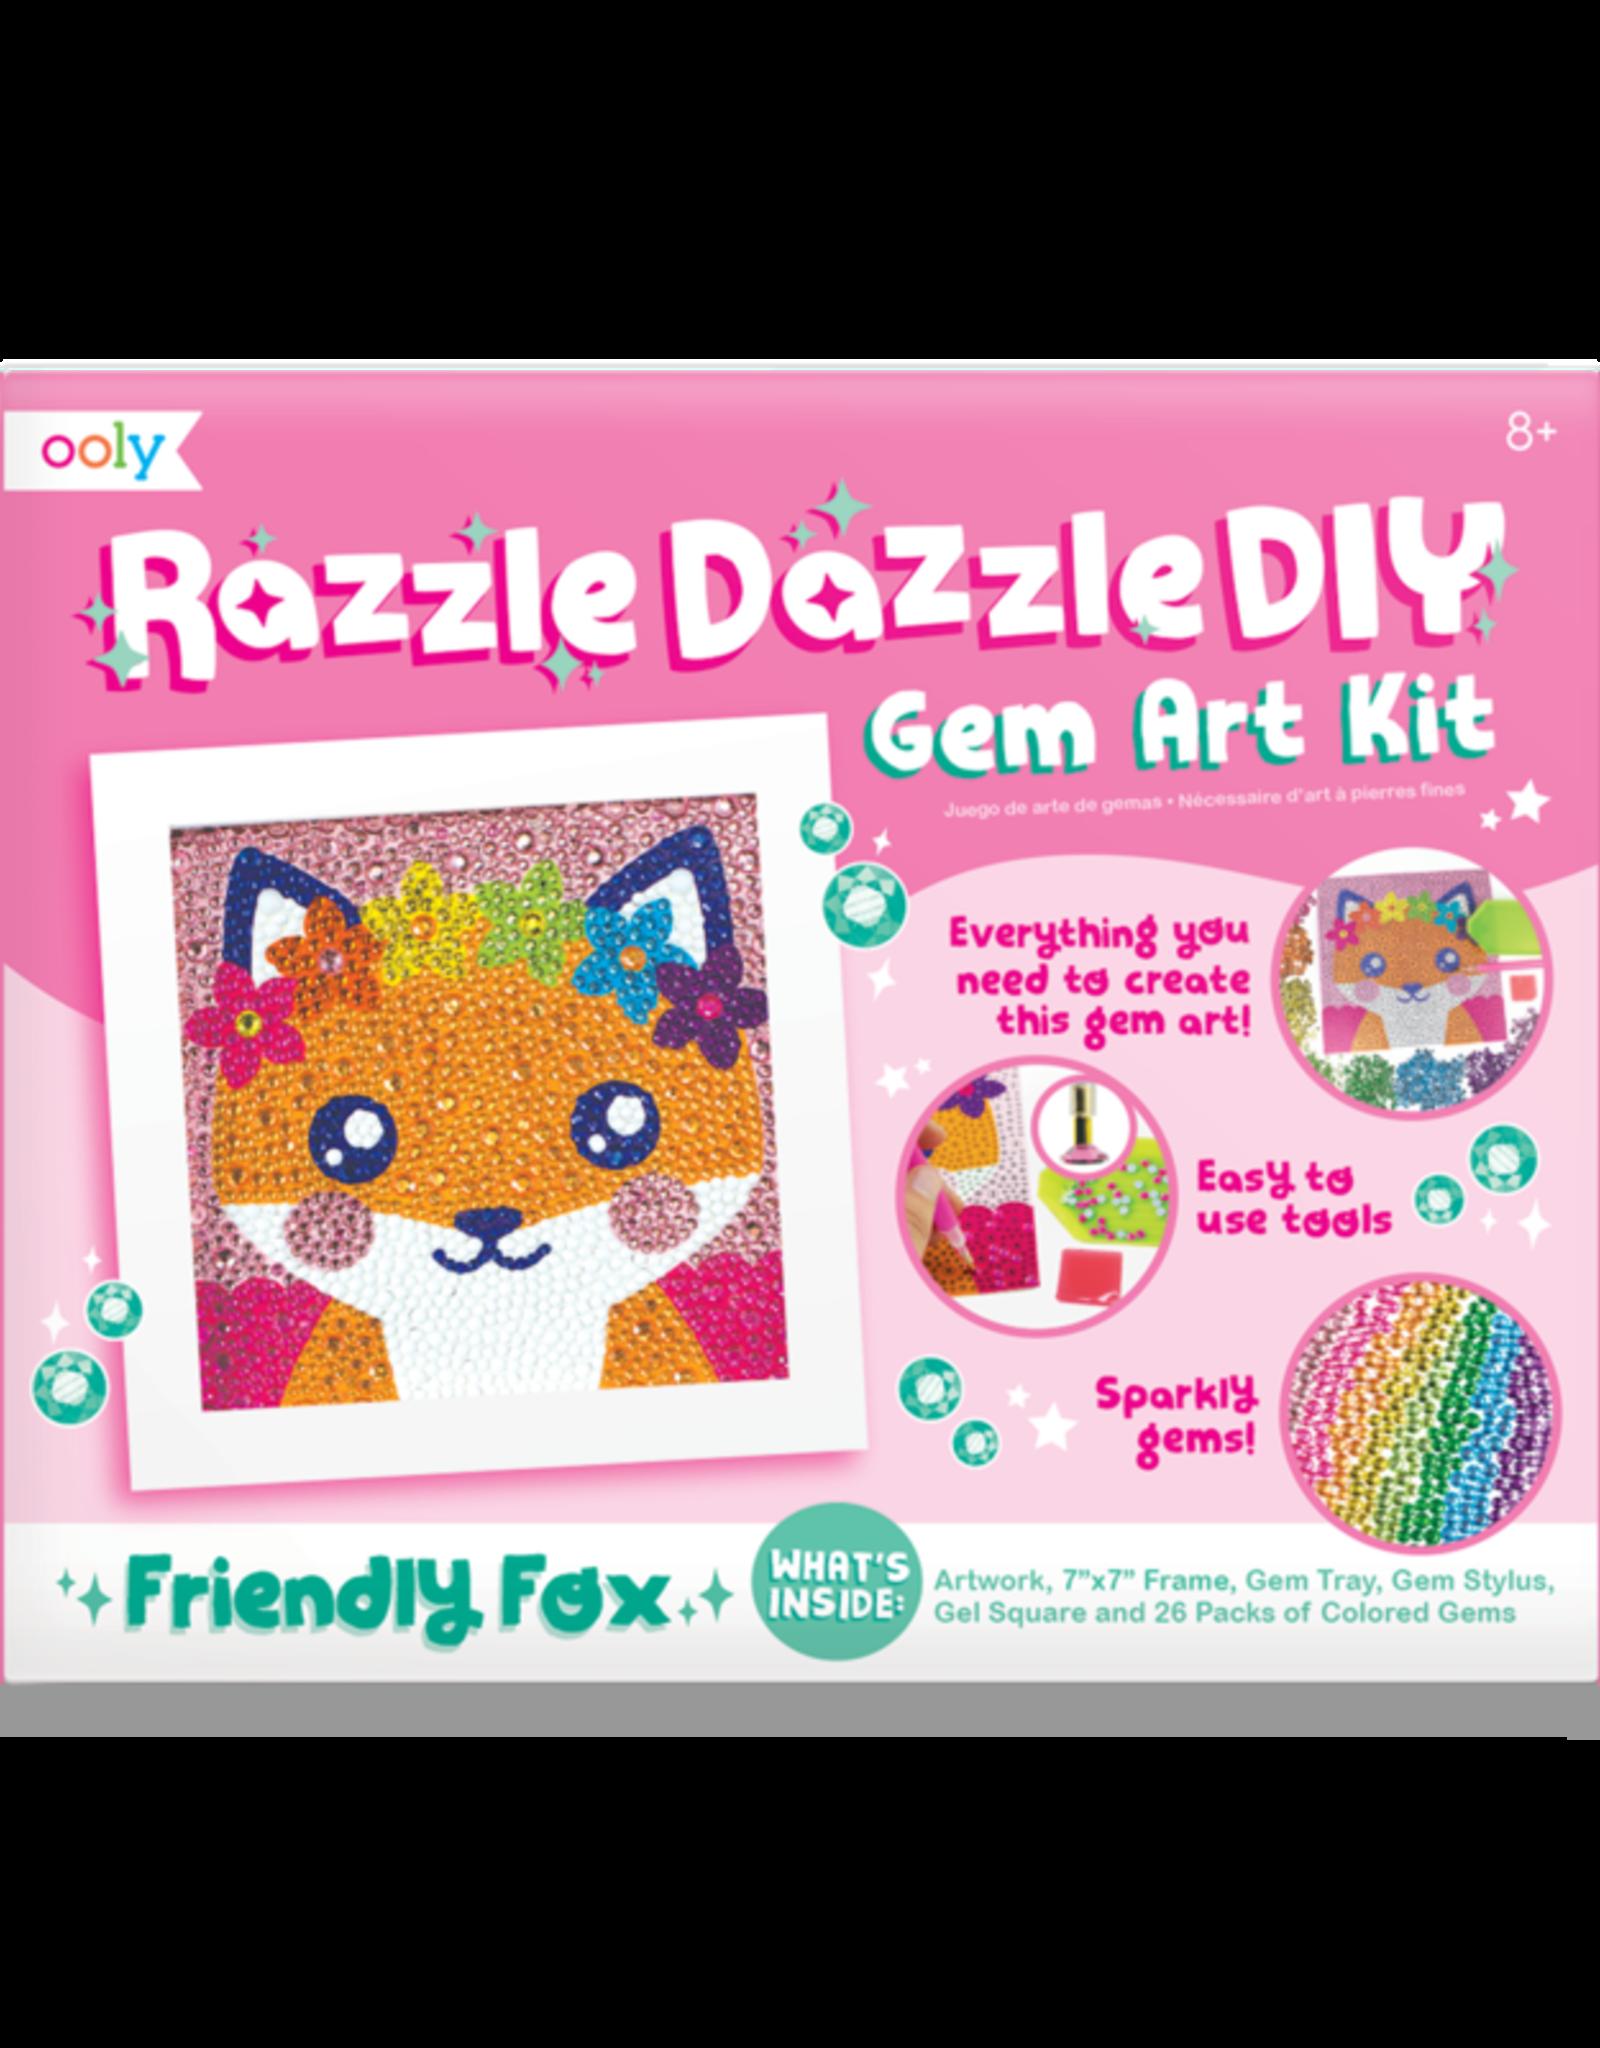 OOLY Razzle Dazzle D.I.Y. Gem Art Kit: Friendly Fox